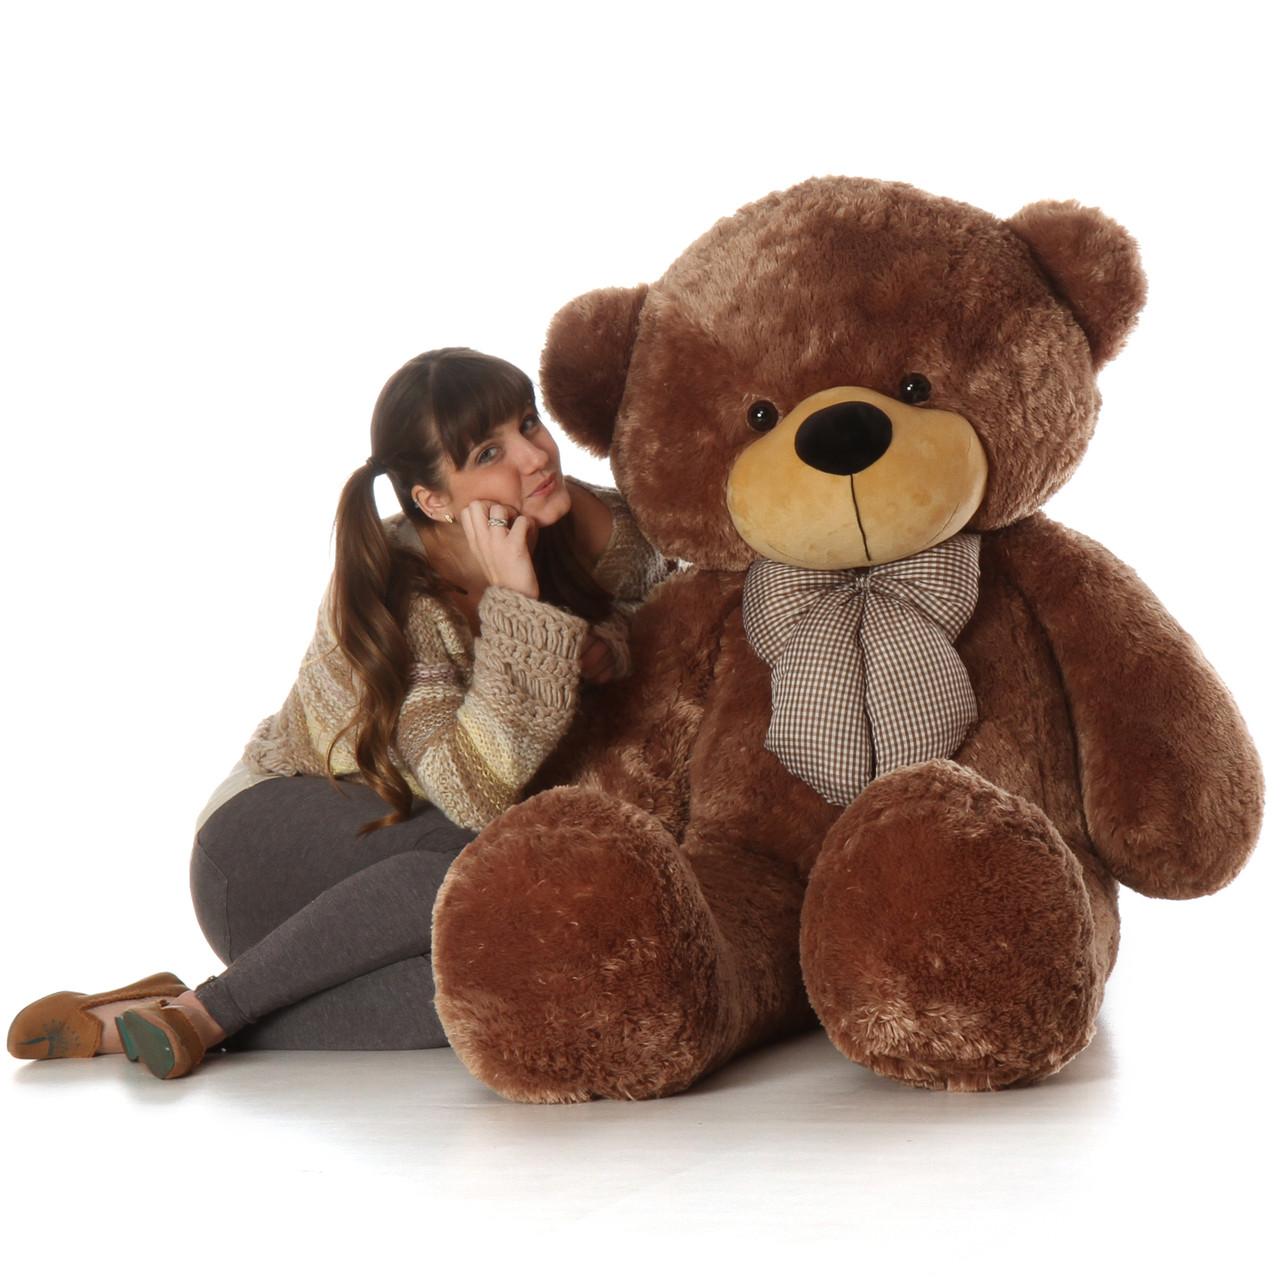 5ft Best Selling Life Size Teddy Bear Sunny Cuddles beautifully soft mocha fur